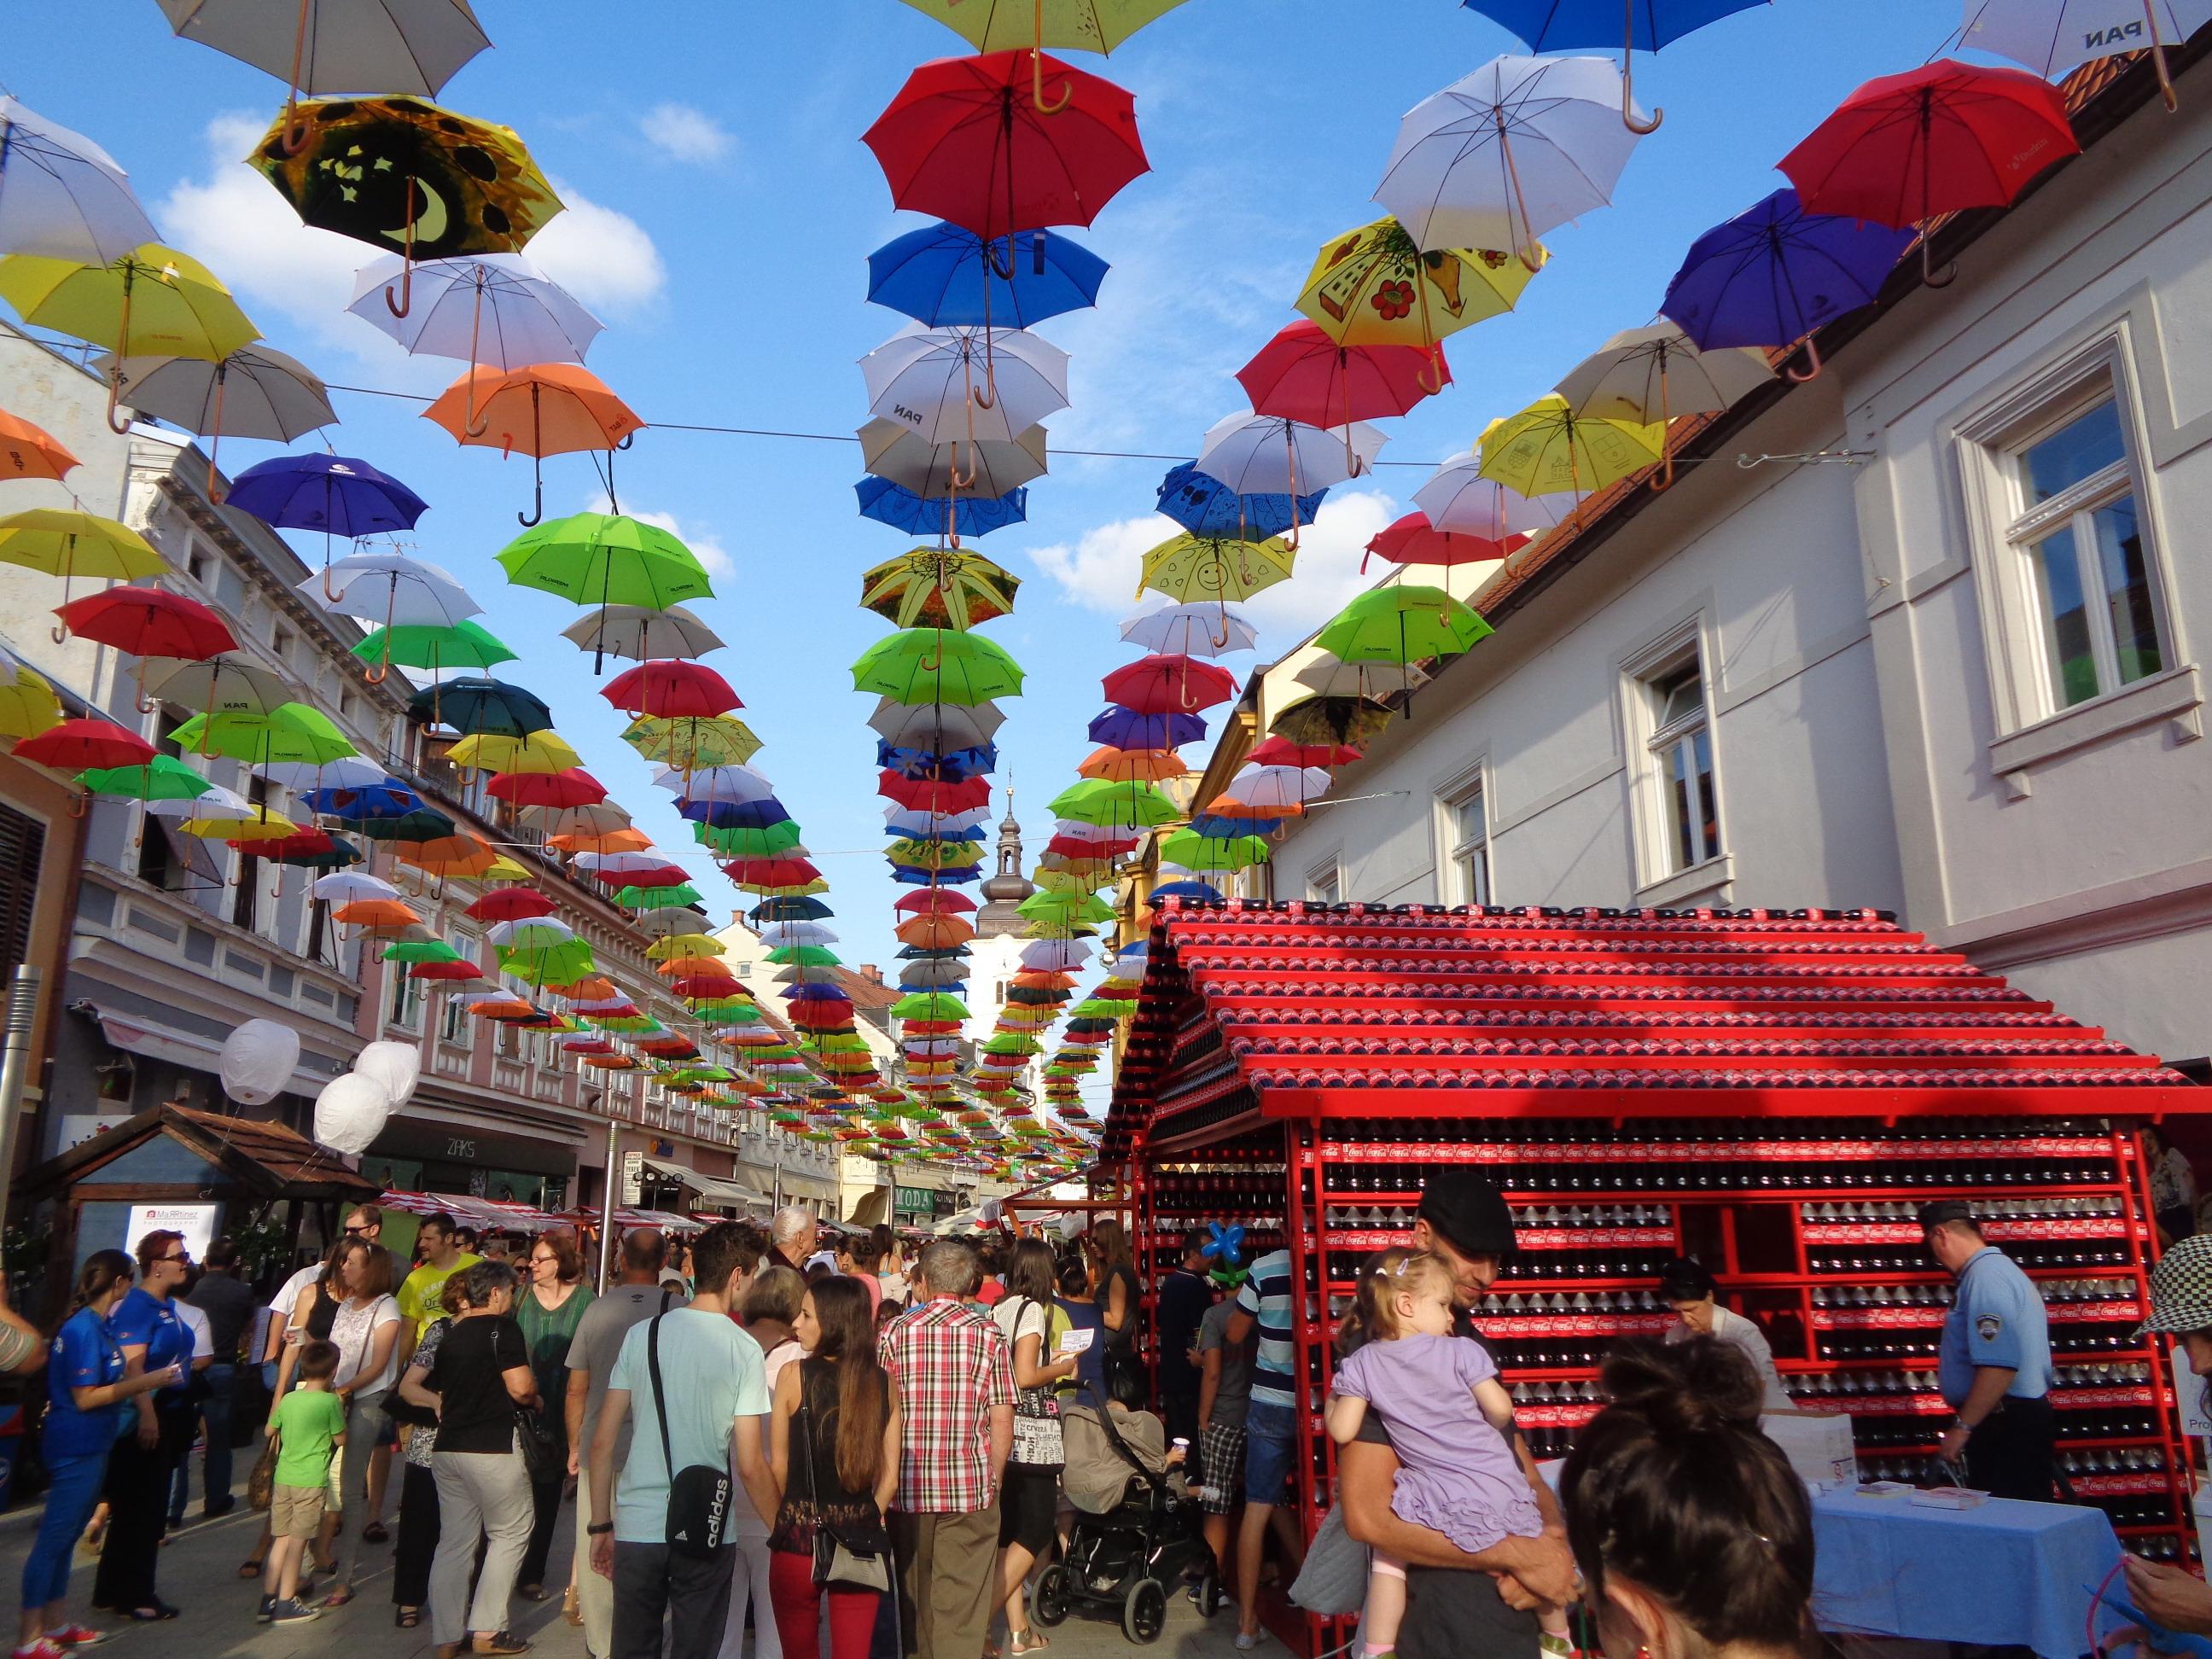 guarda sol grande reforçado personalizado em festival - Maria Pumar industria